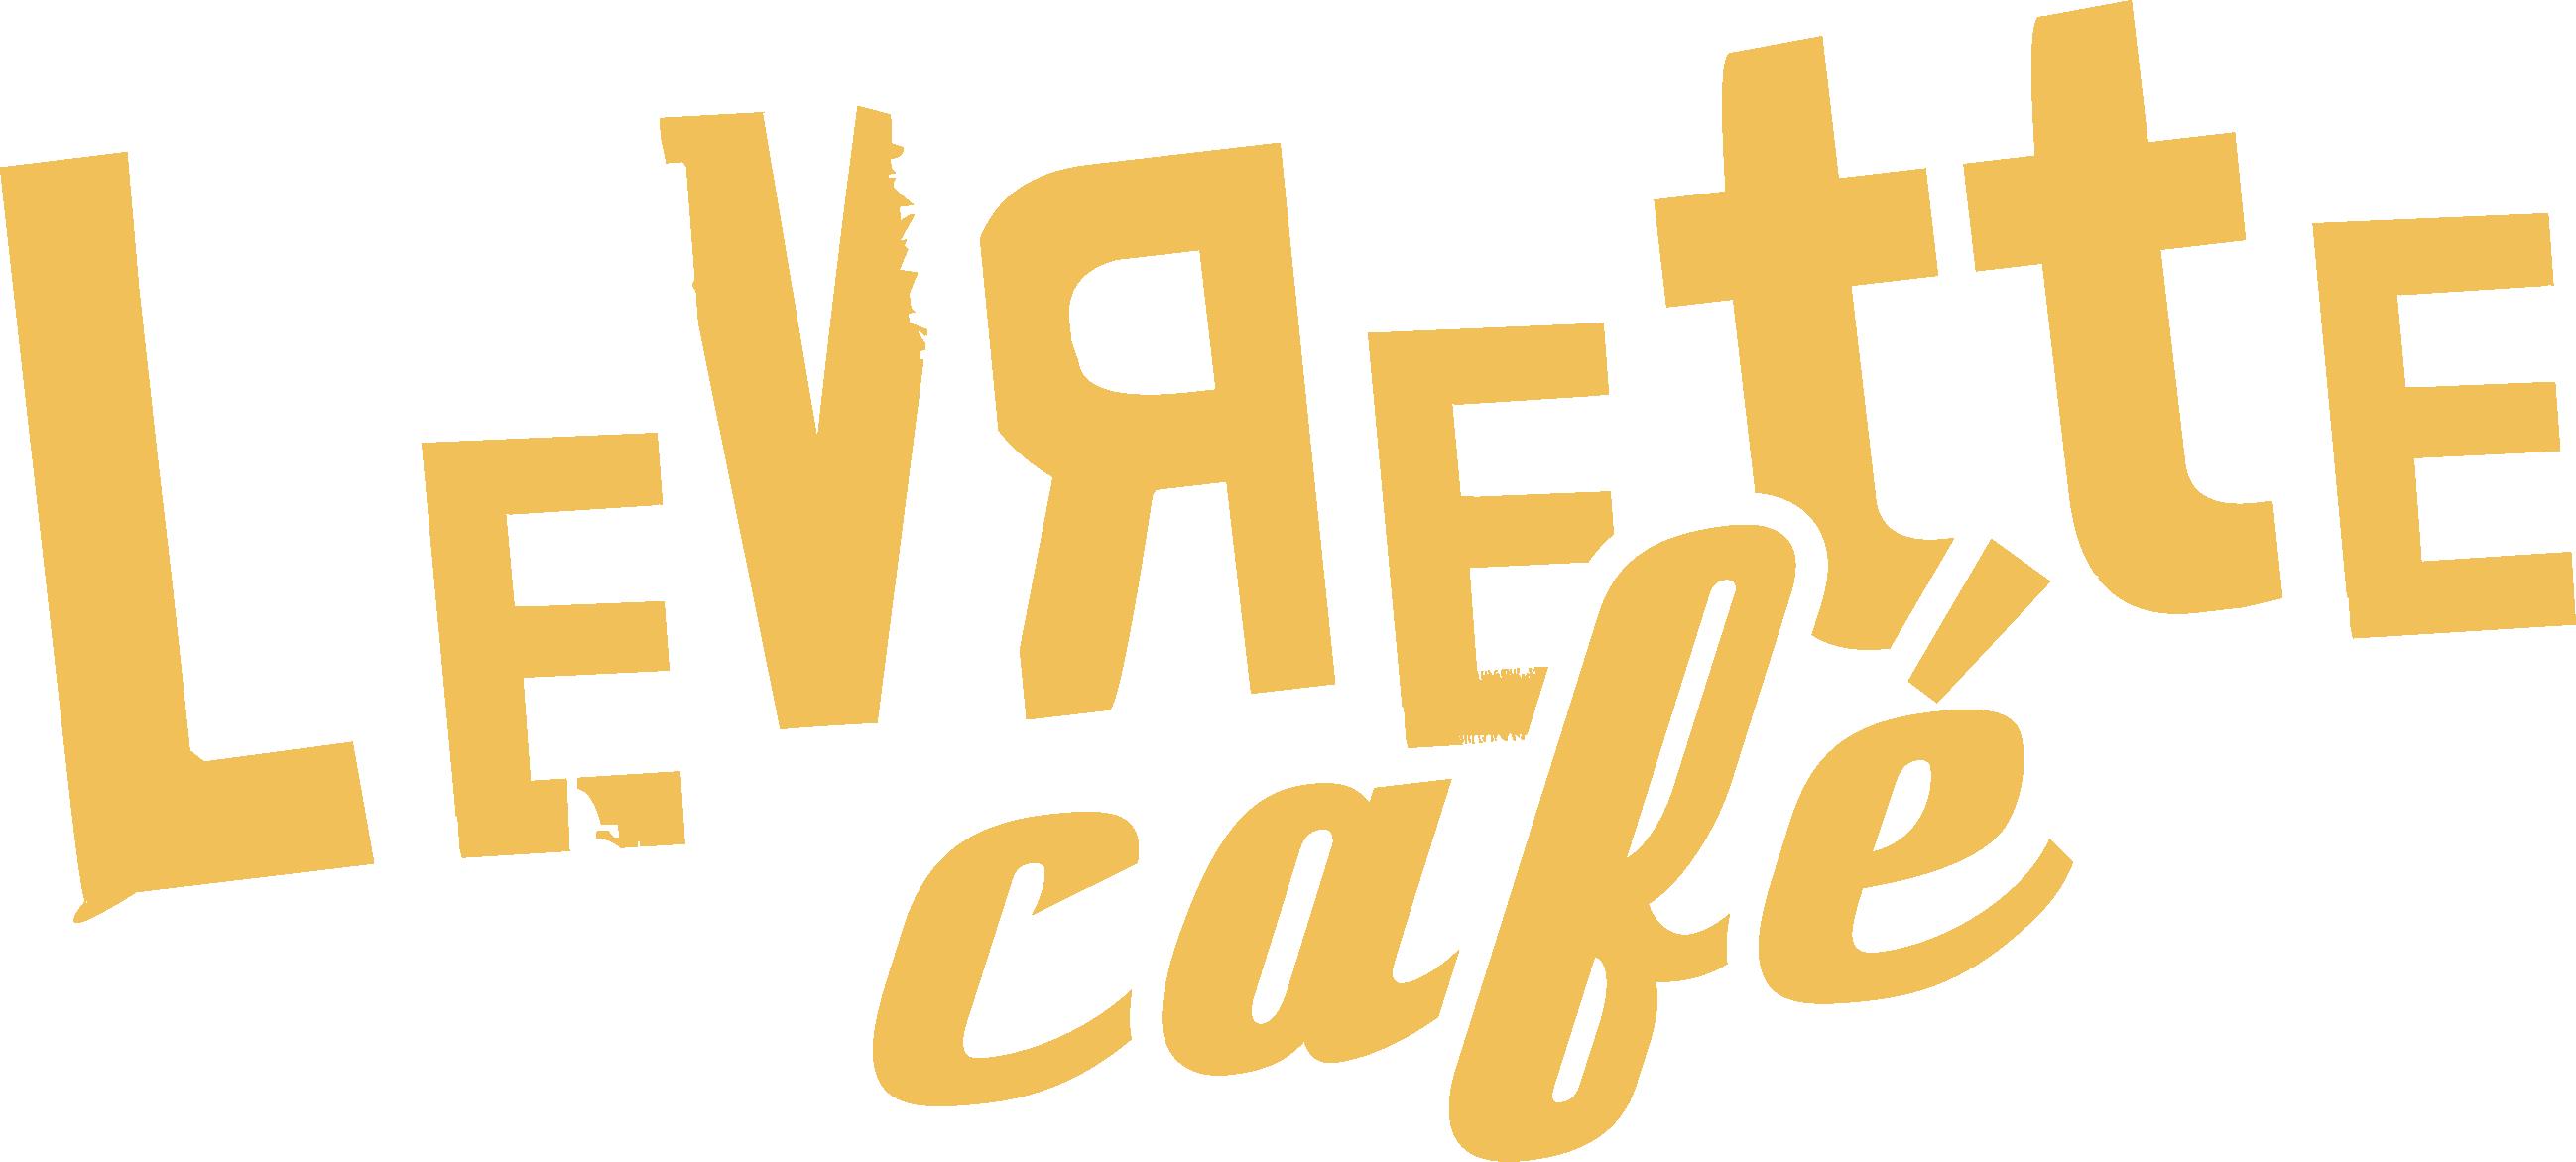 Logo LC 2020 jaune